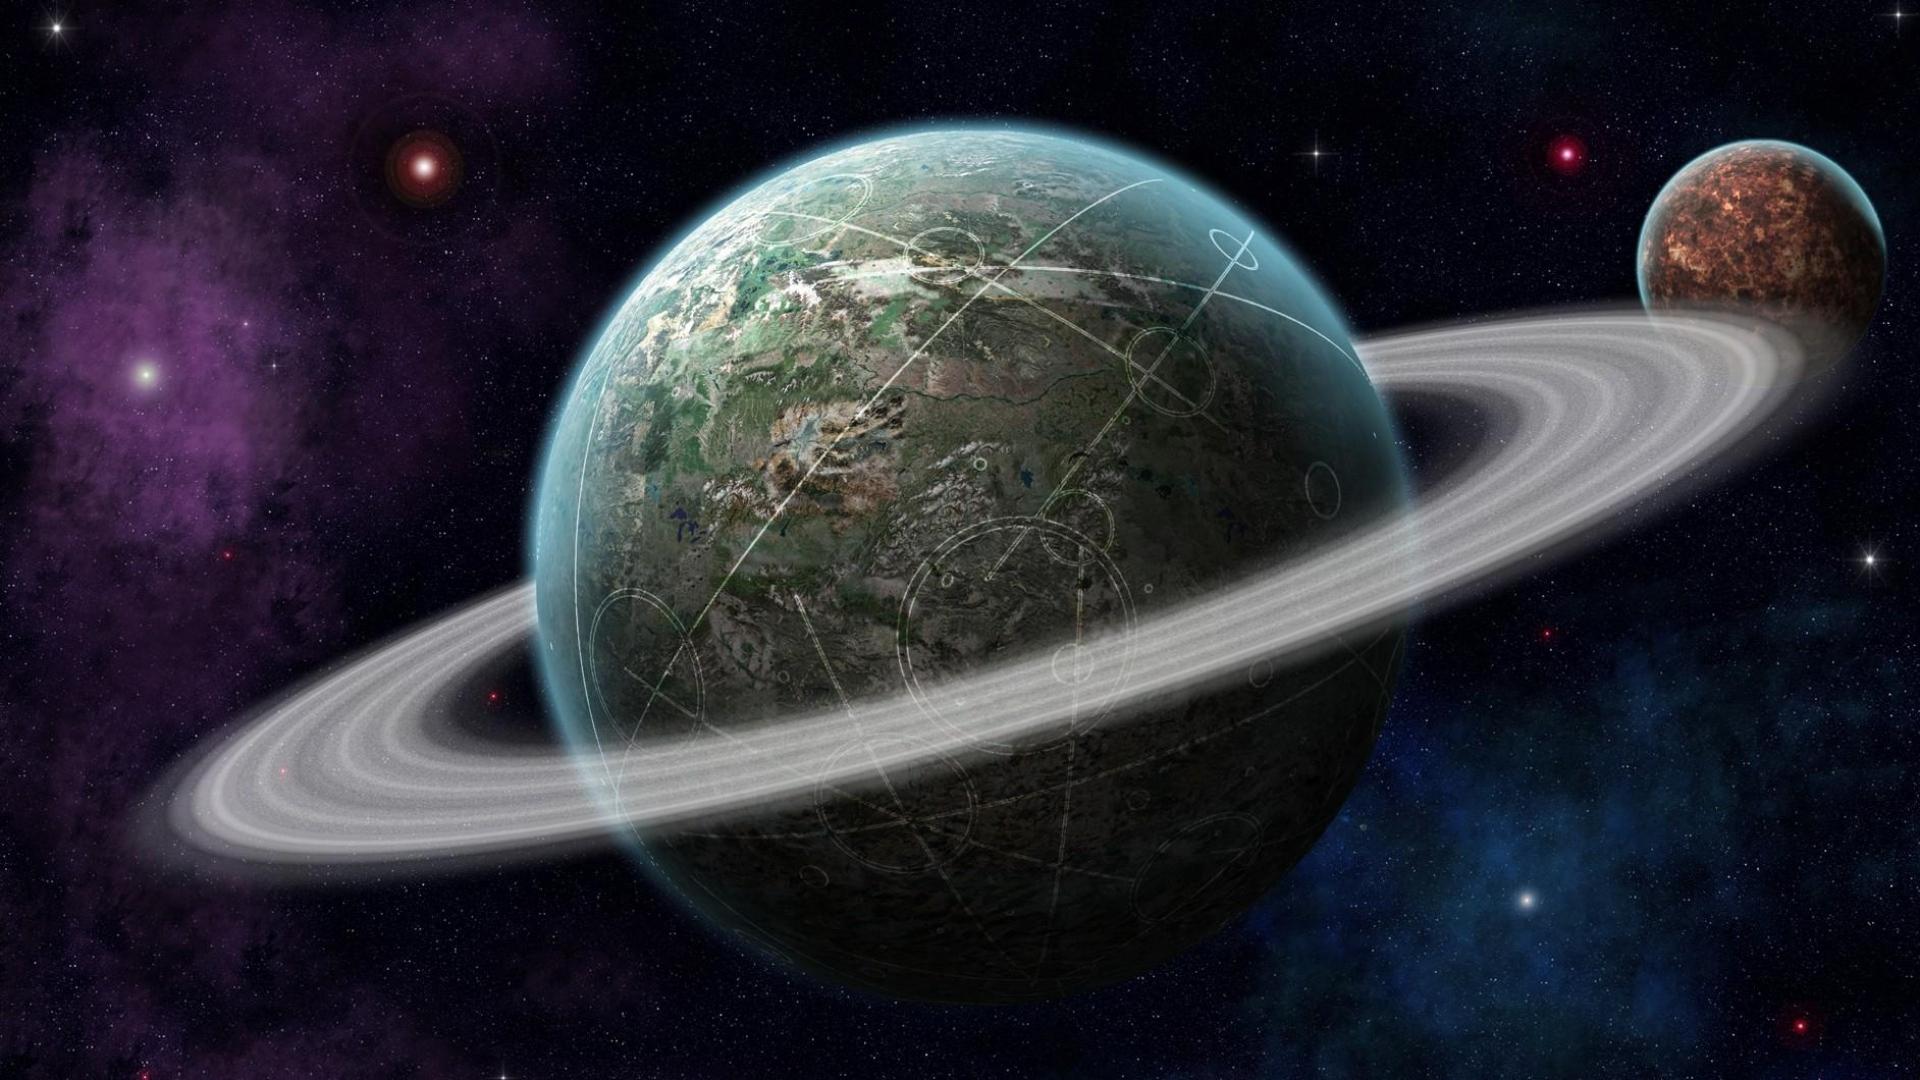 Download Wallpaper 1920x1080 Planet Universe Orbit Space Stars